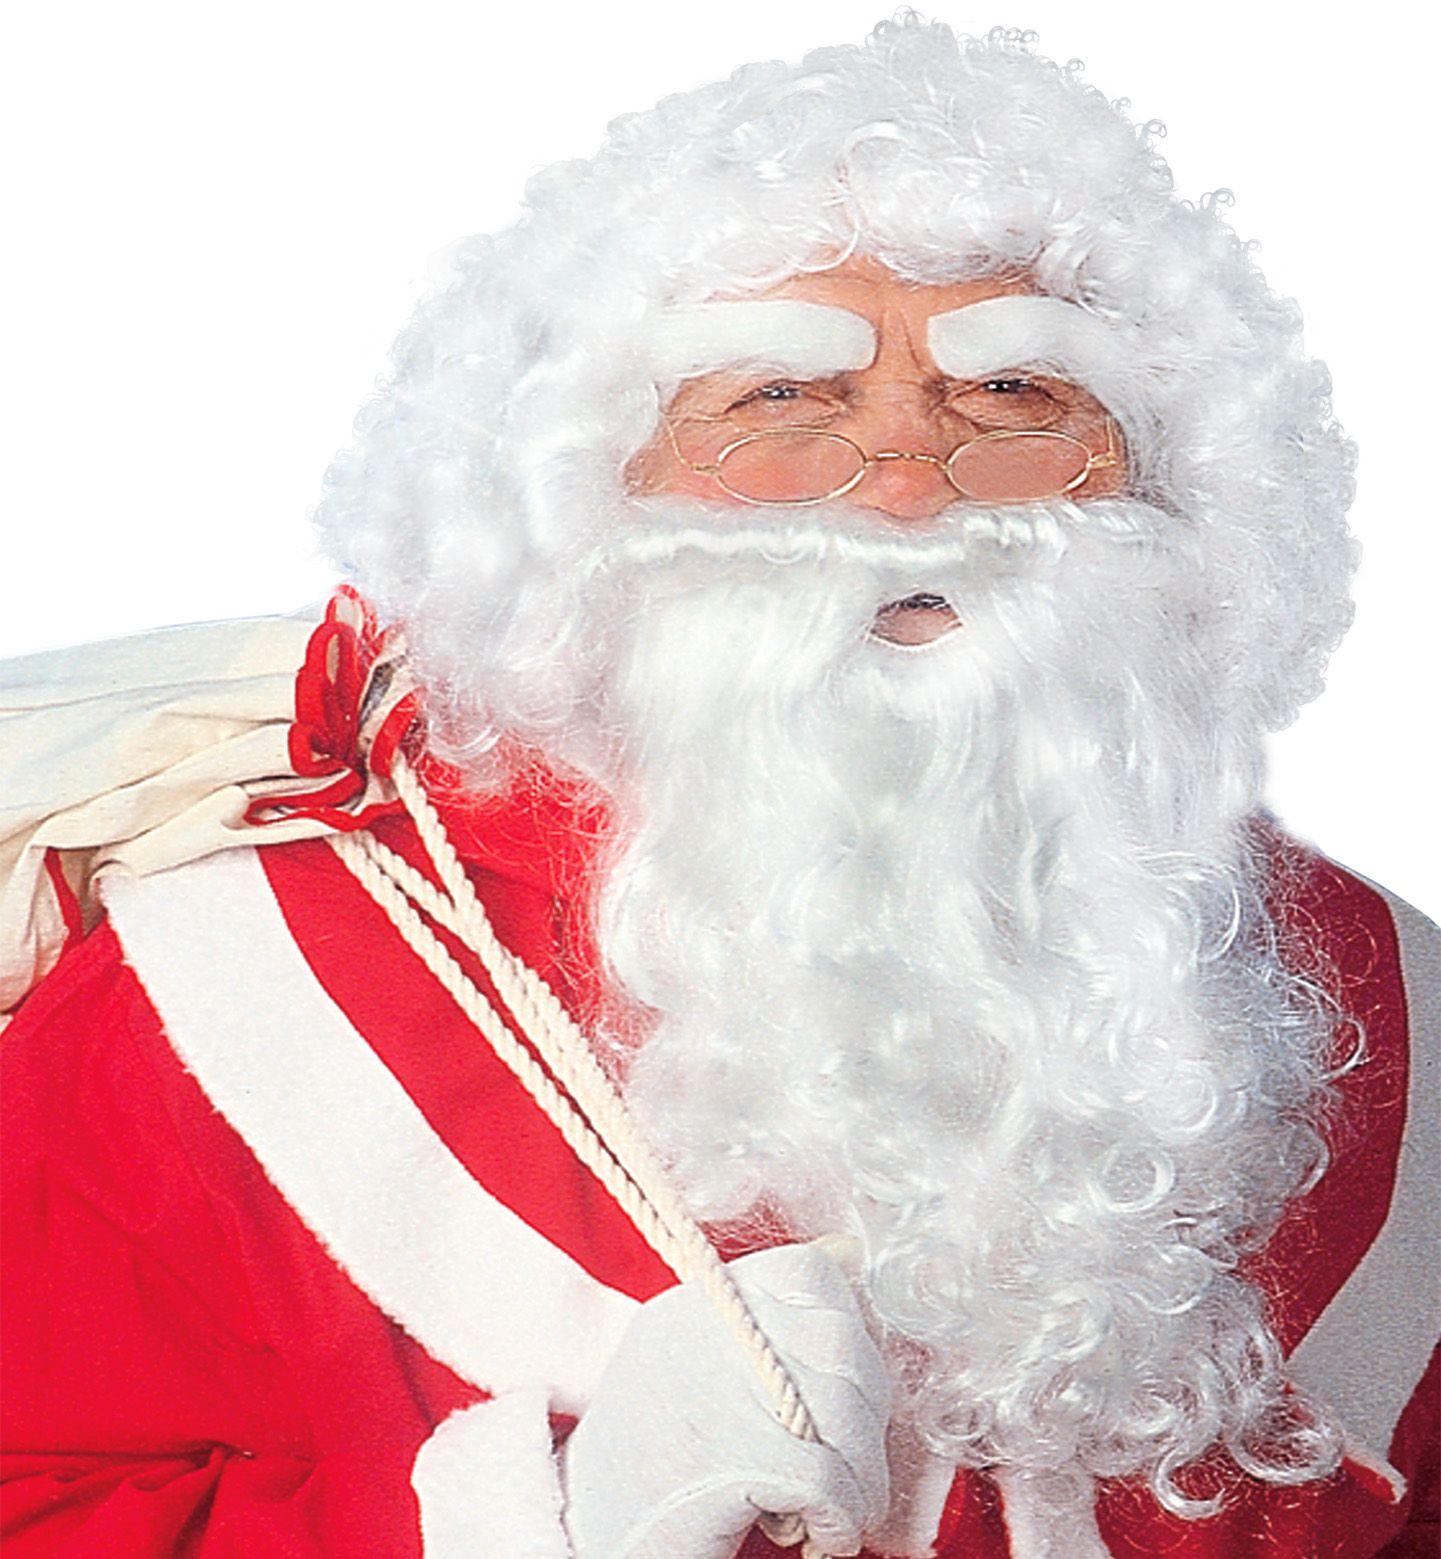 Luxe kerstman pruik met baard en wenkbrauwen